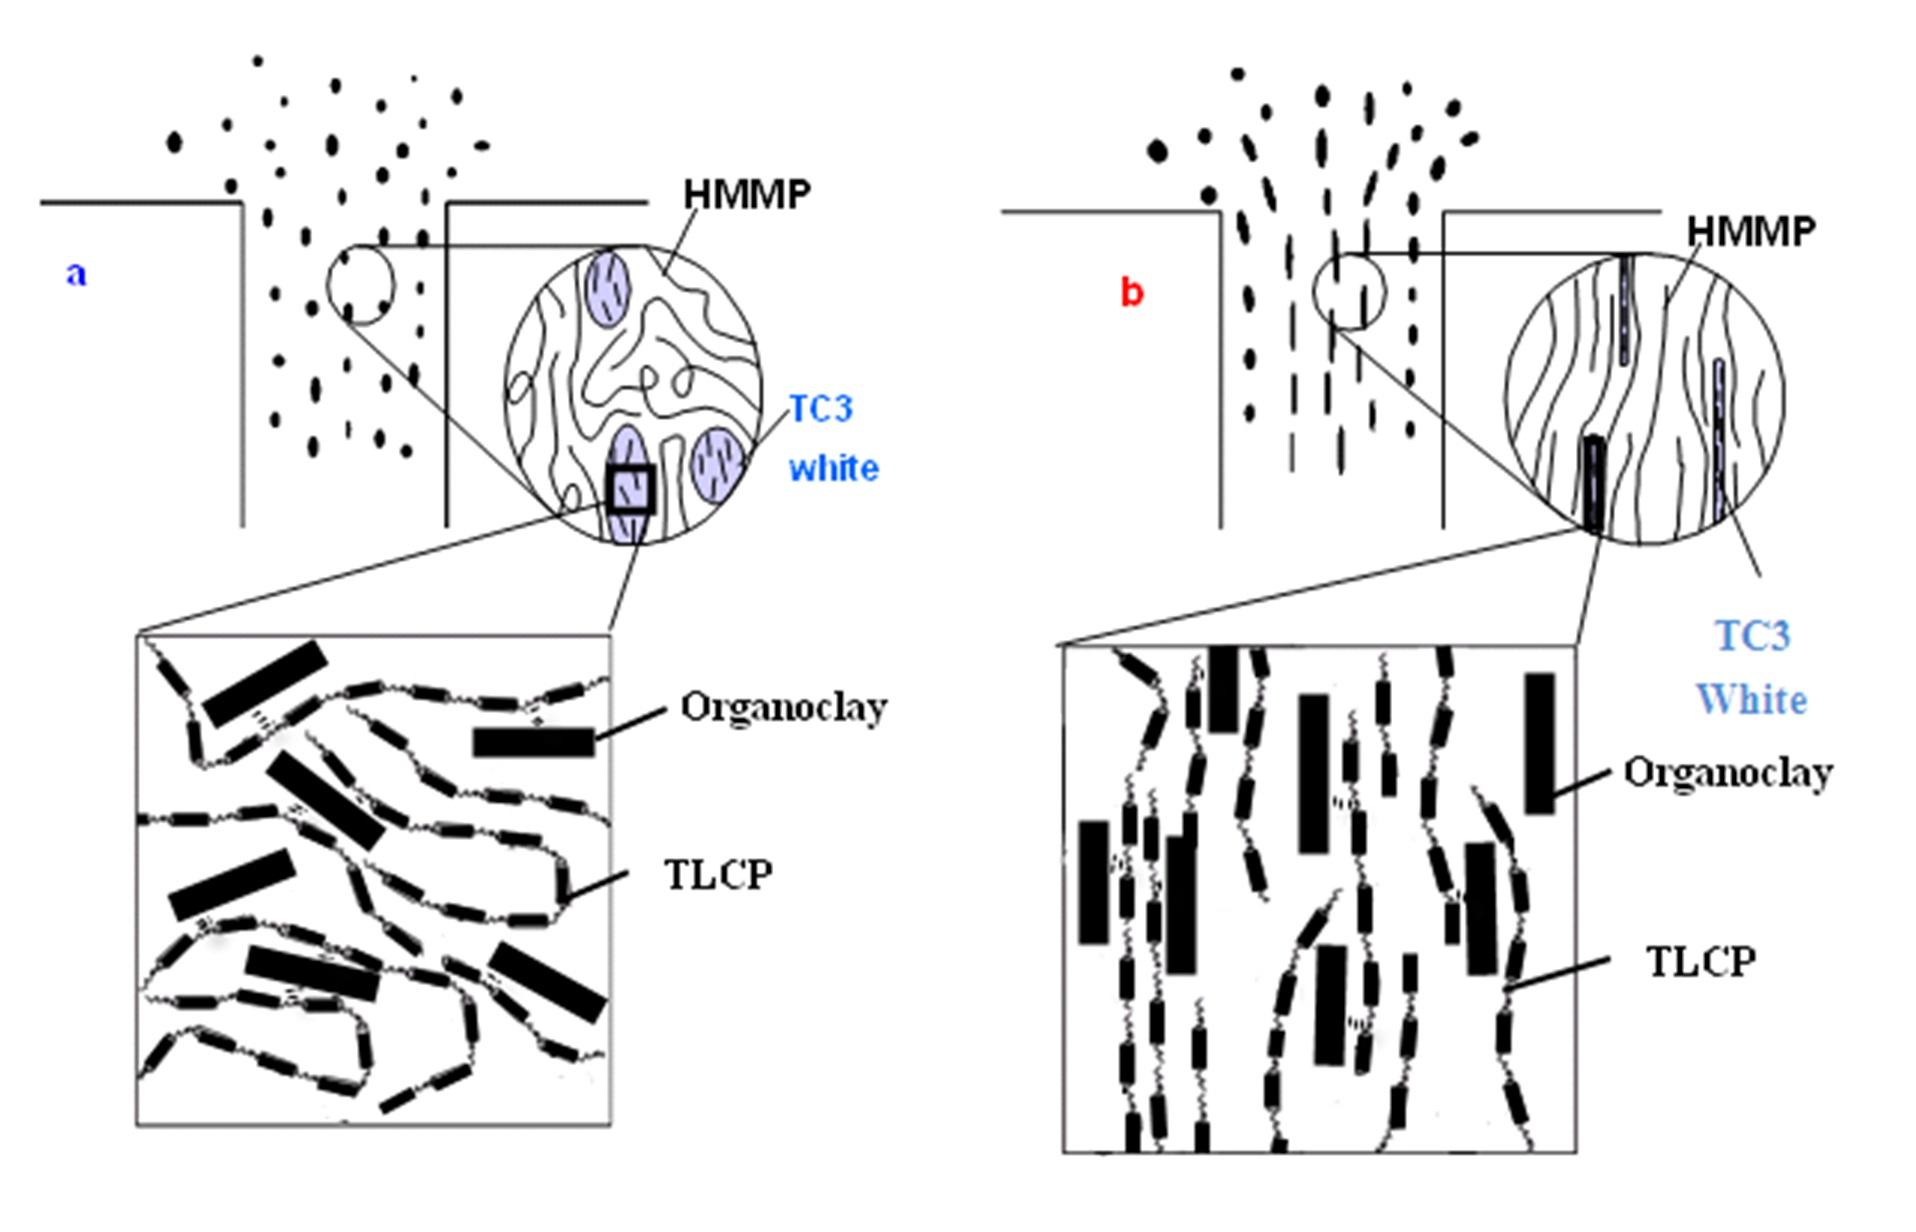 Micro-Rheological Study on Fully Exfoliated Organoclay